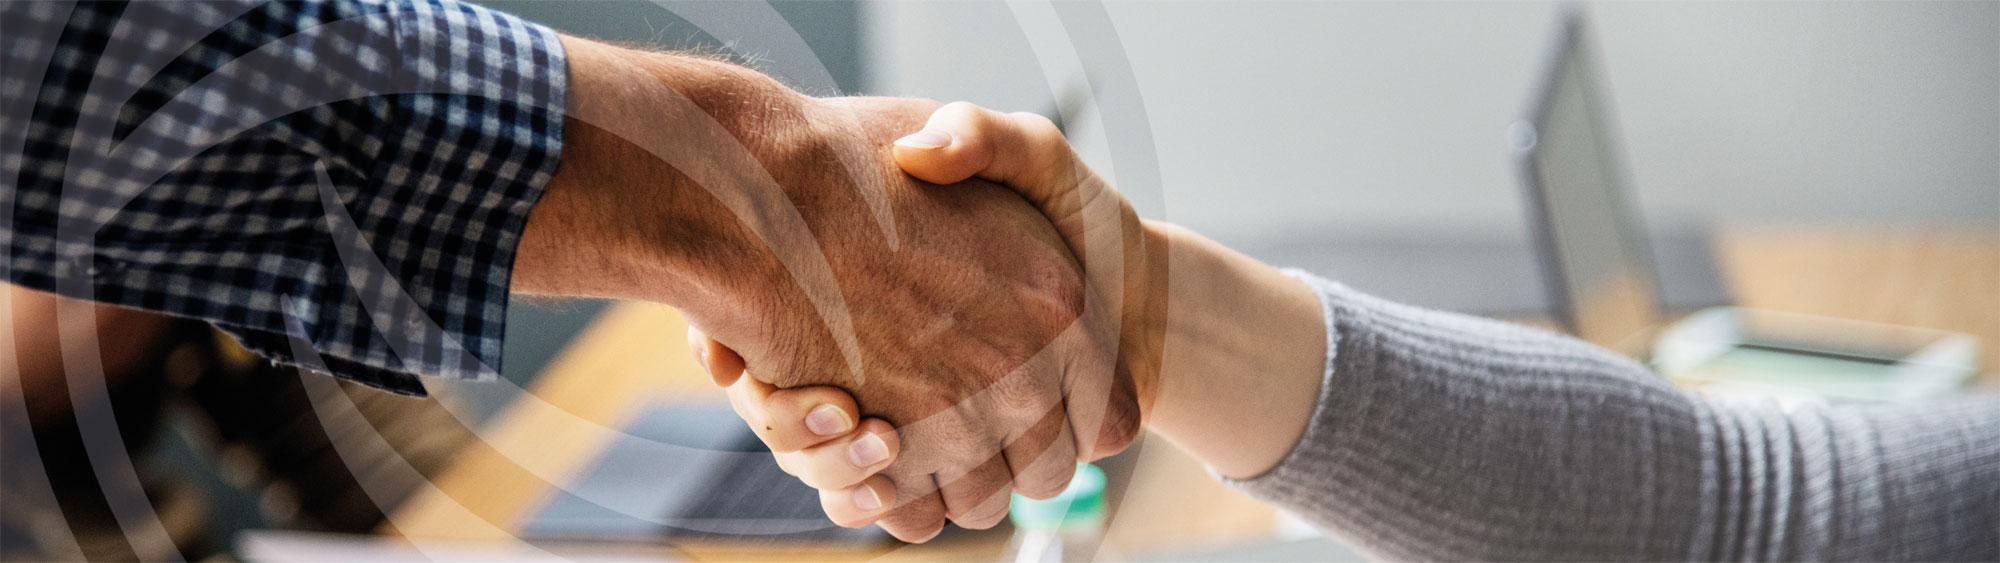 Become a BioCote partner